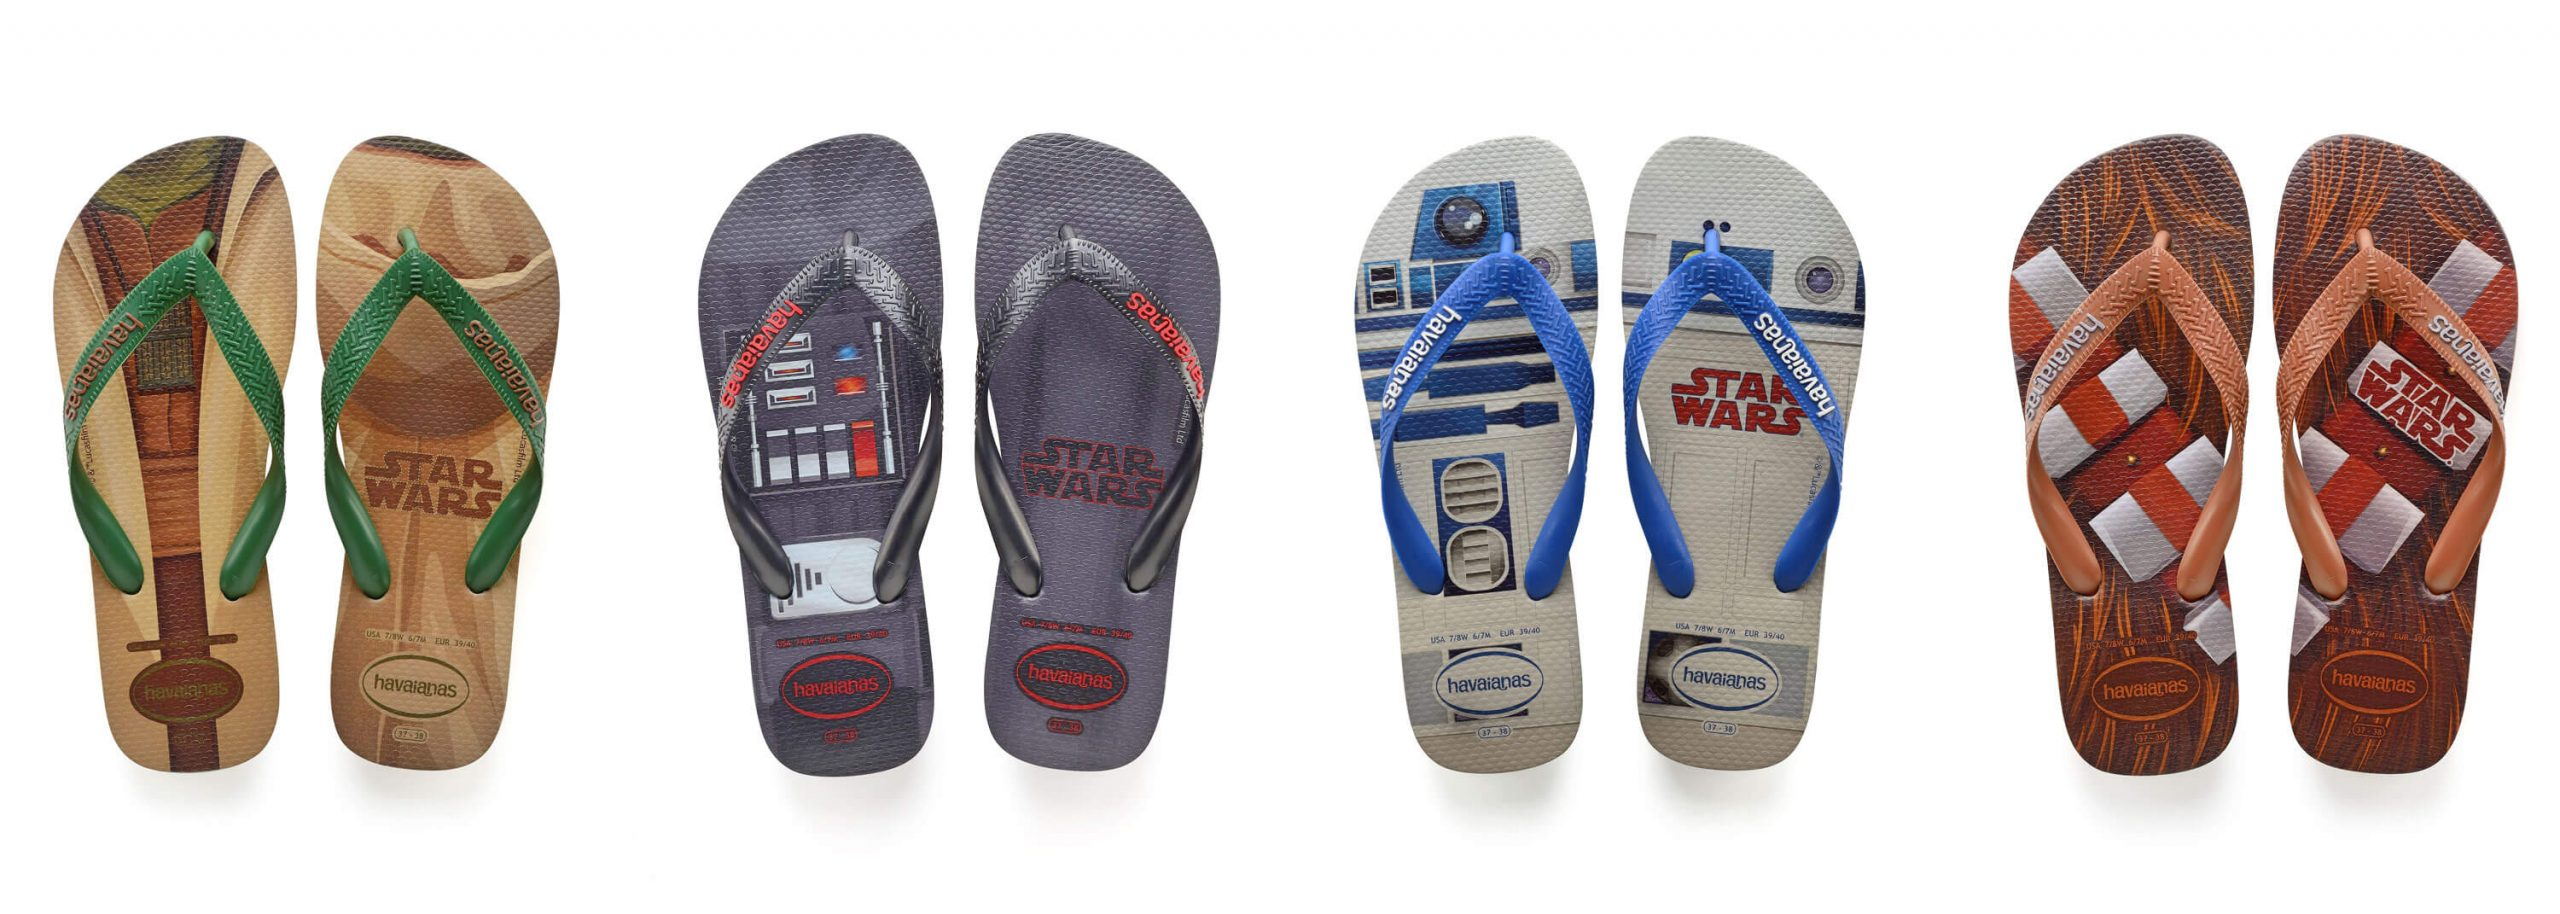 Havaianas Star Wars Collection